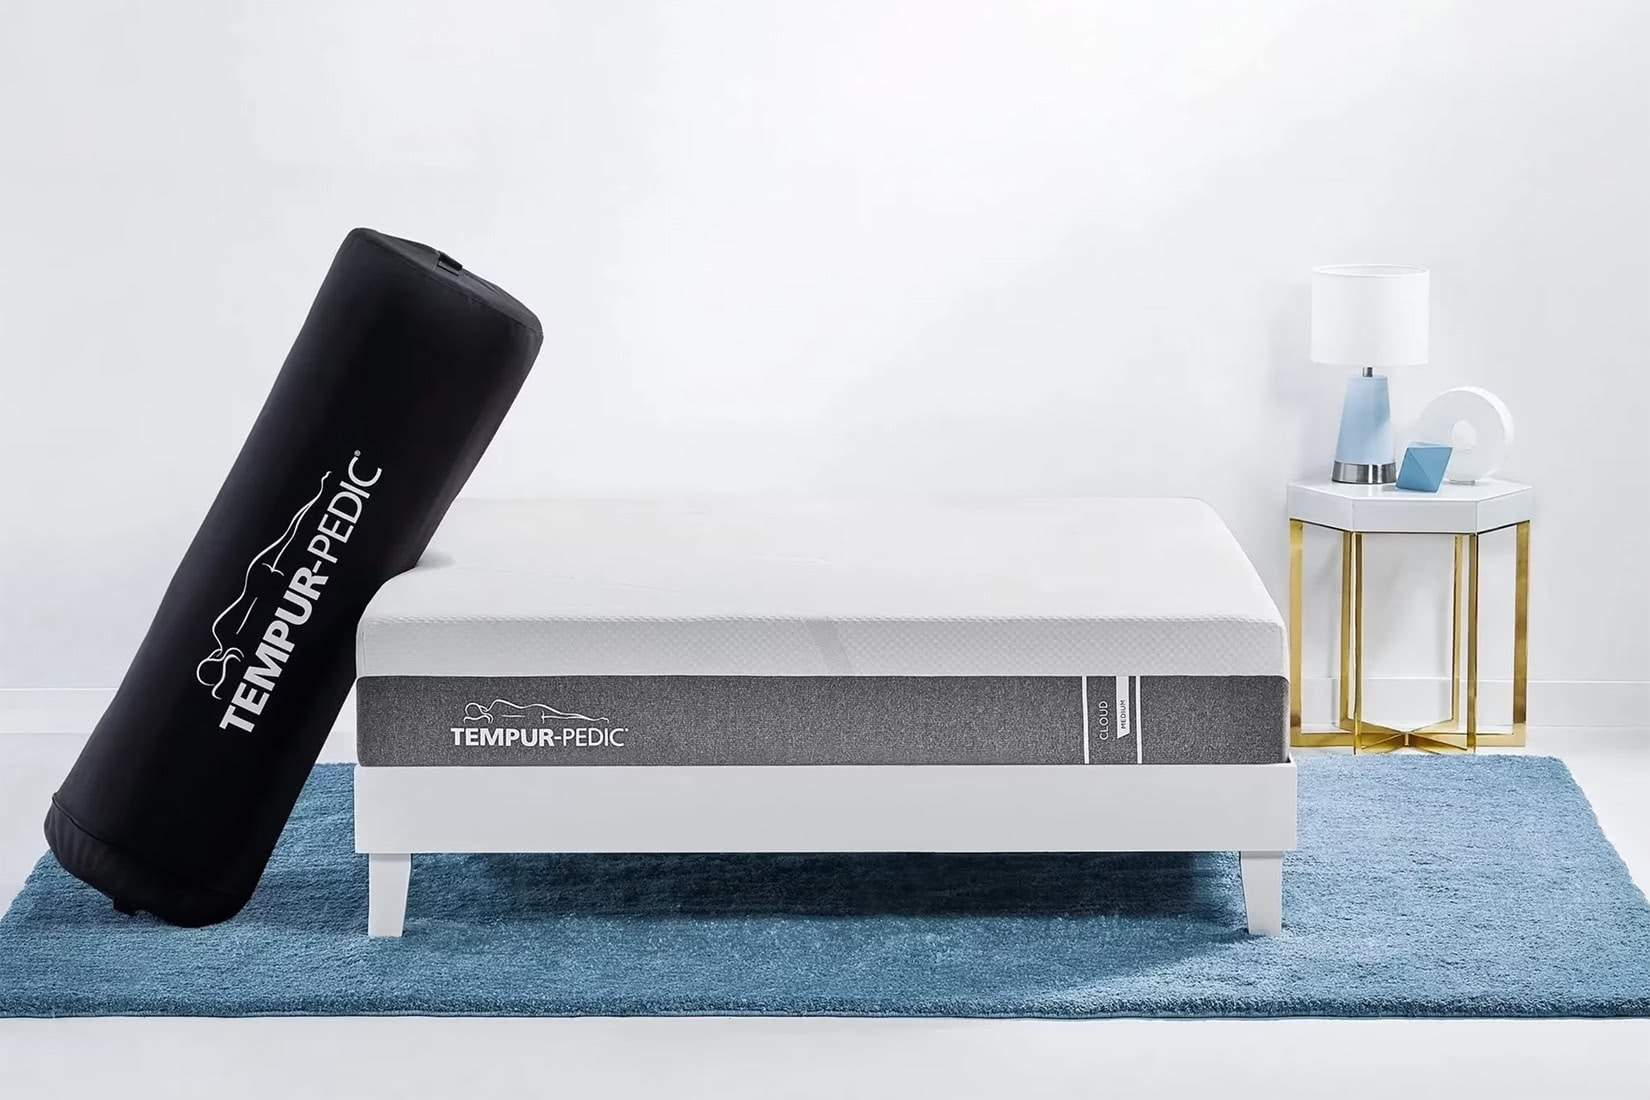 Tempur-Pedic cloud mattress review - Luxe Digital